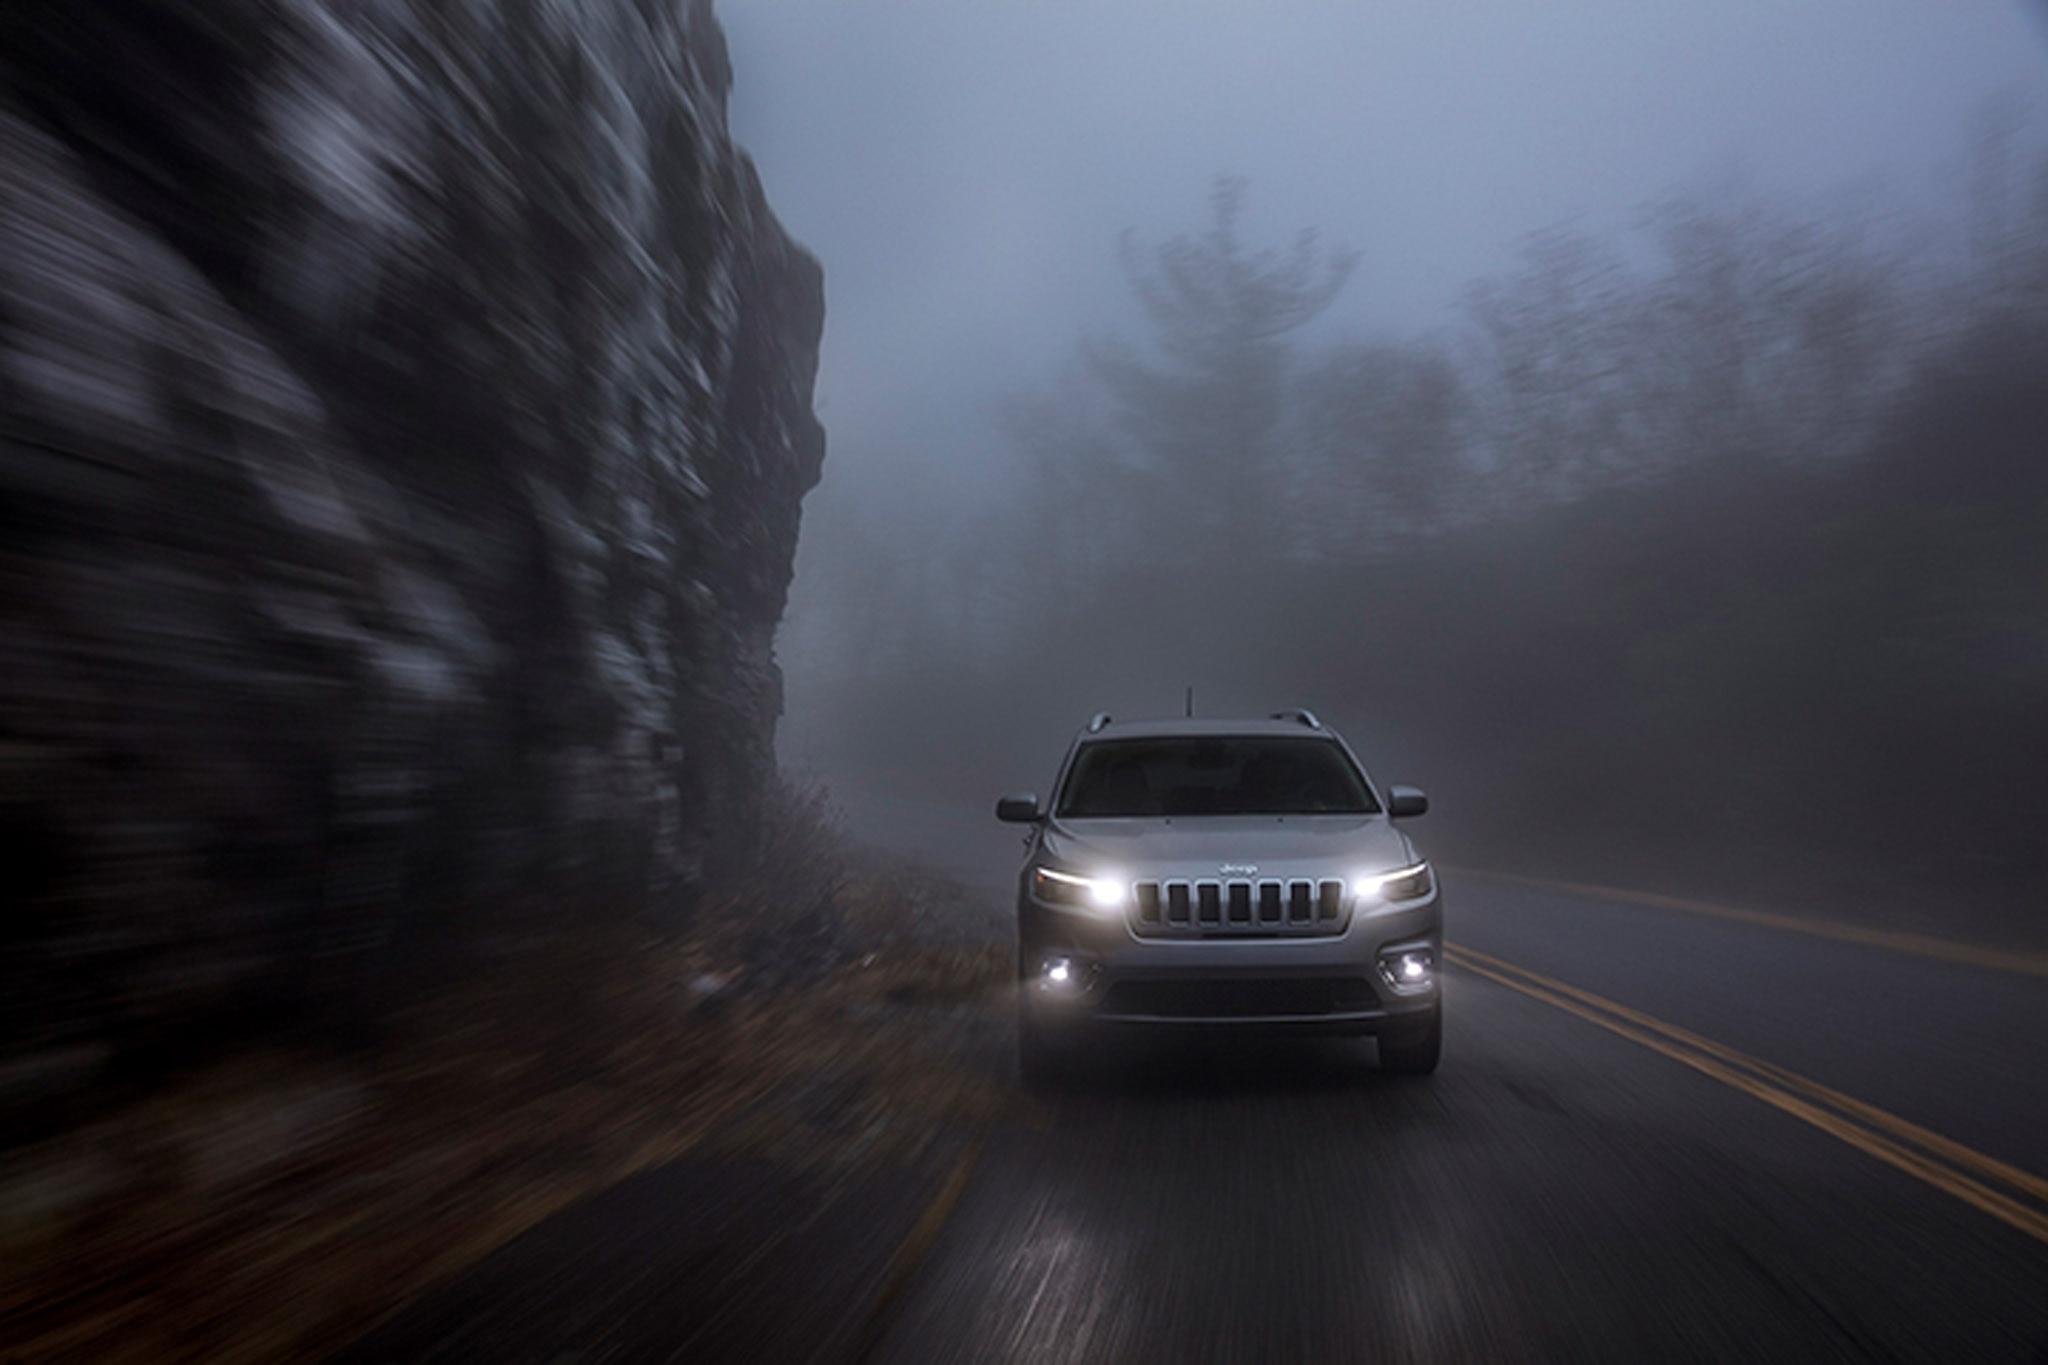 2019 Jeep Cherokee Pricing Announced | Automobile Magazine